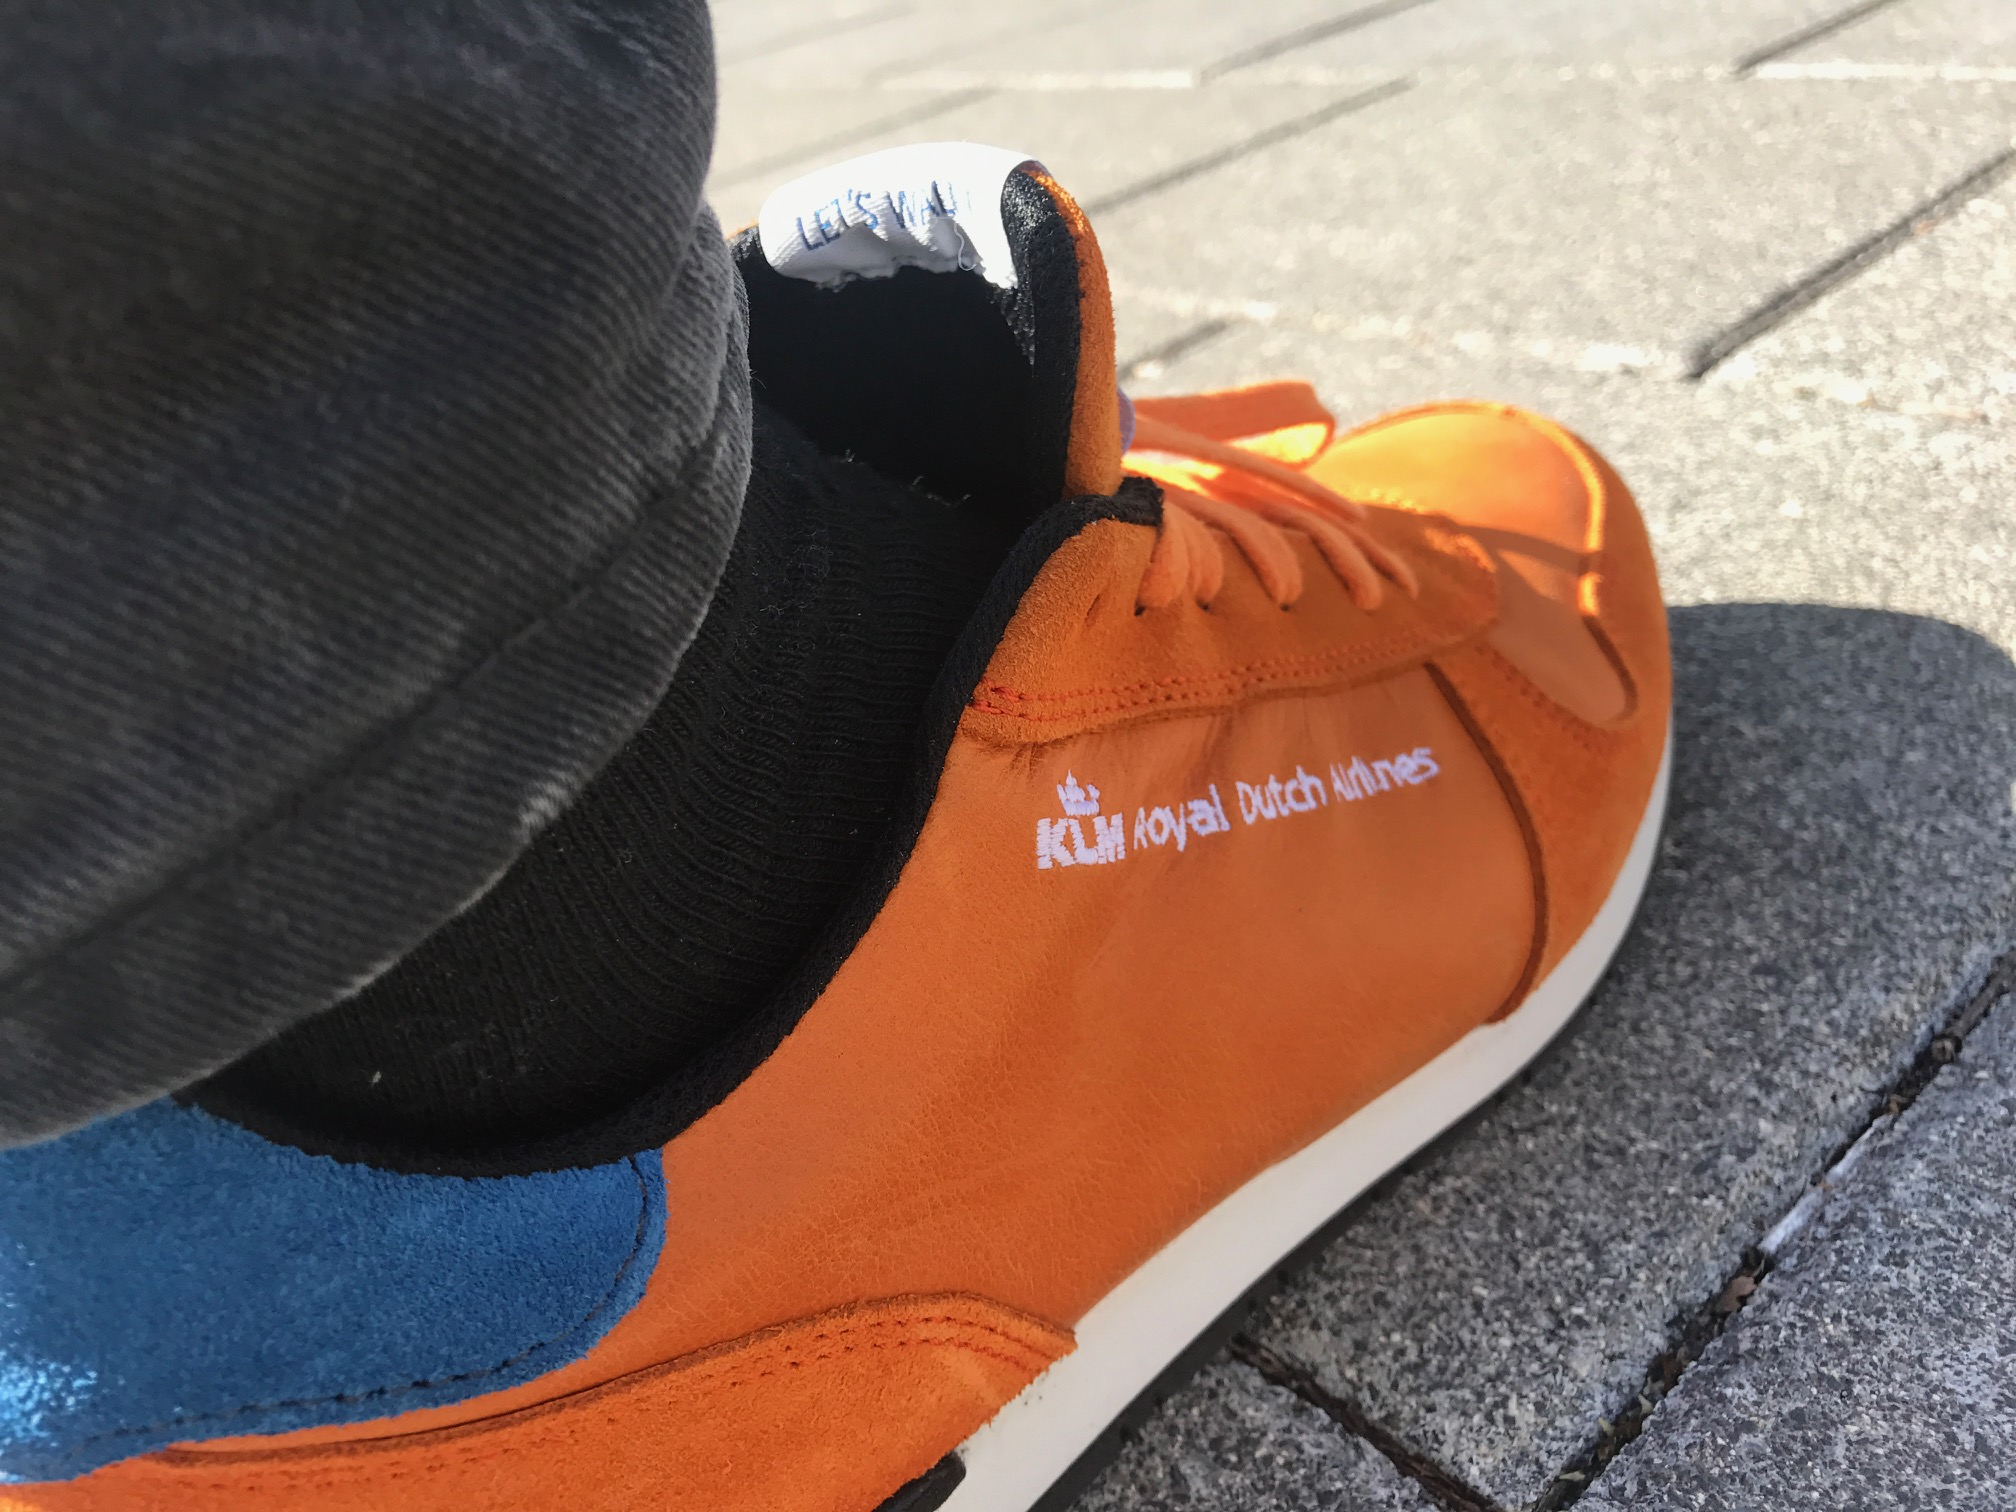 KLM Amsterdam sneakers